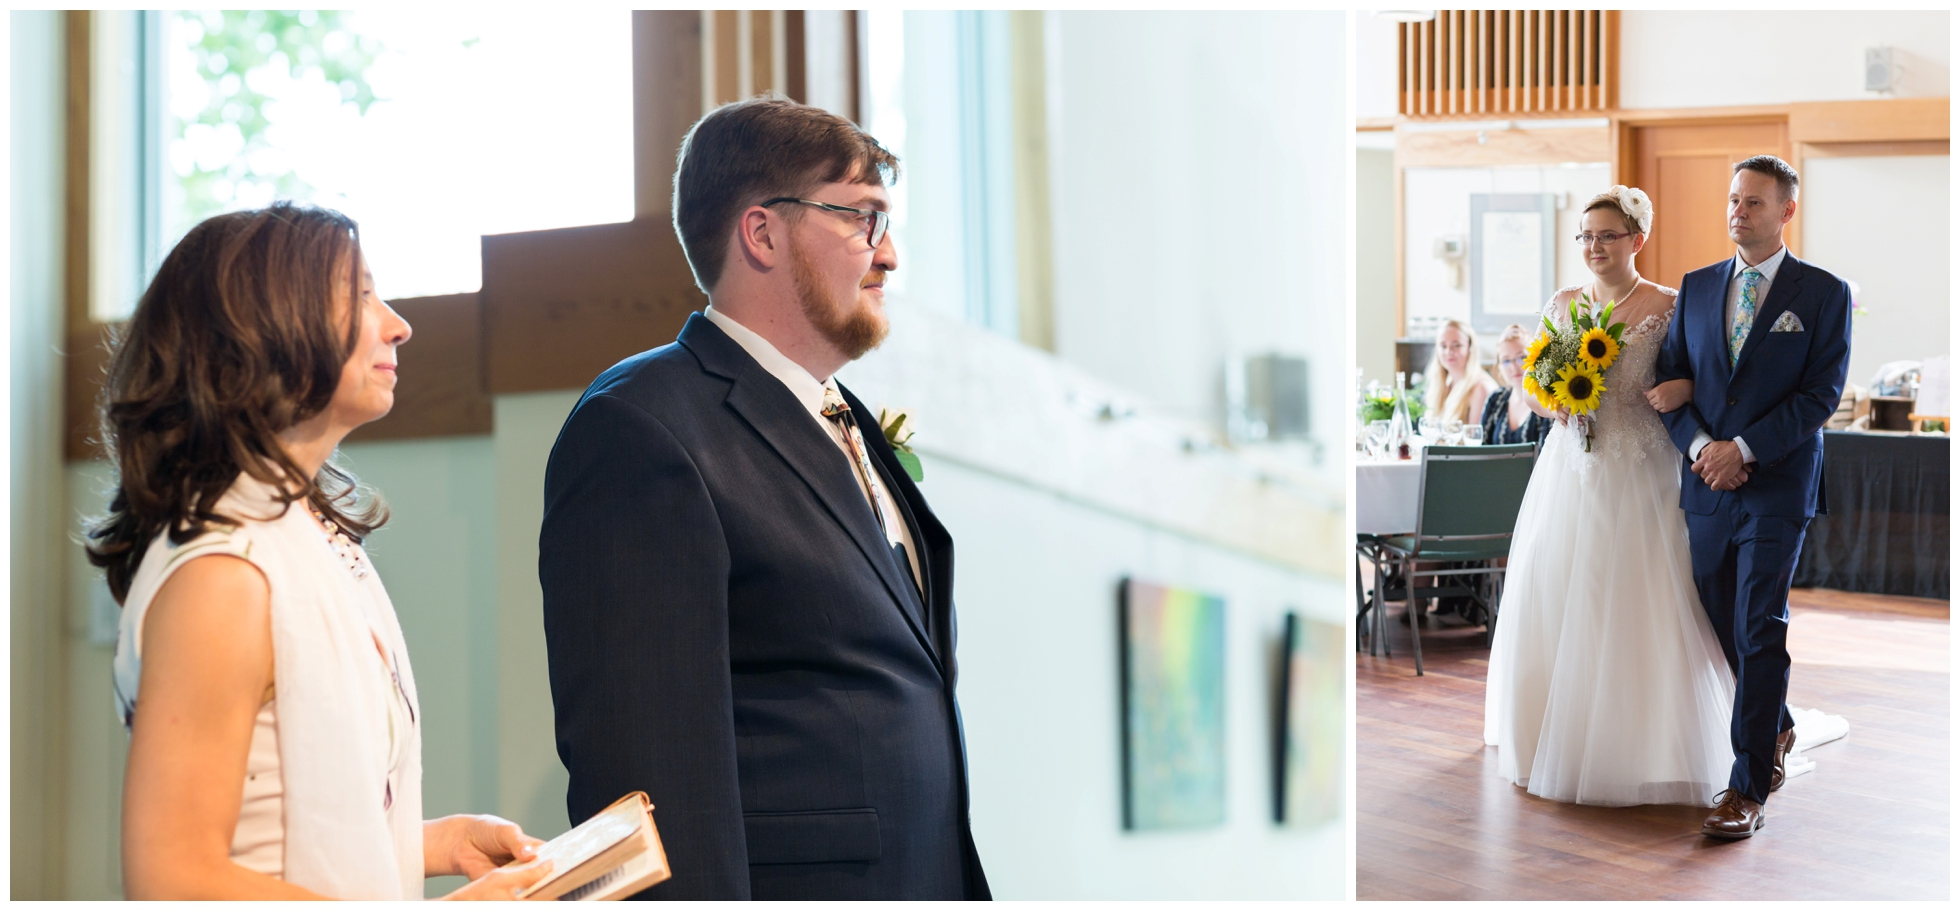 Toronto Wedding Chris Kate (Selena Phillips-Boyle)_0002.jpg